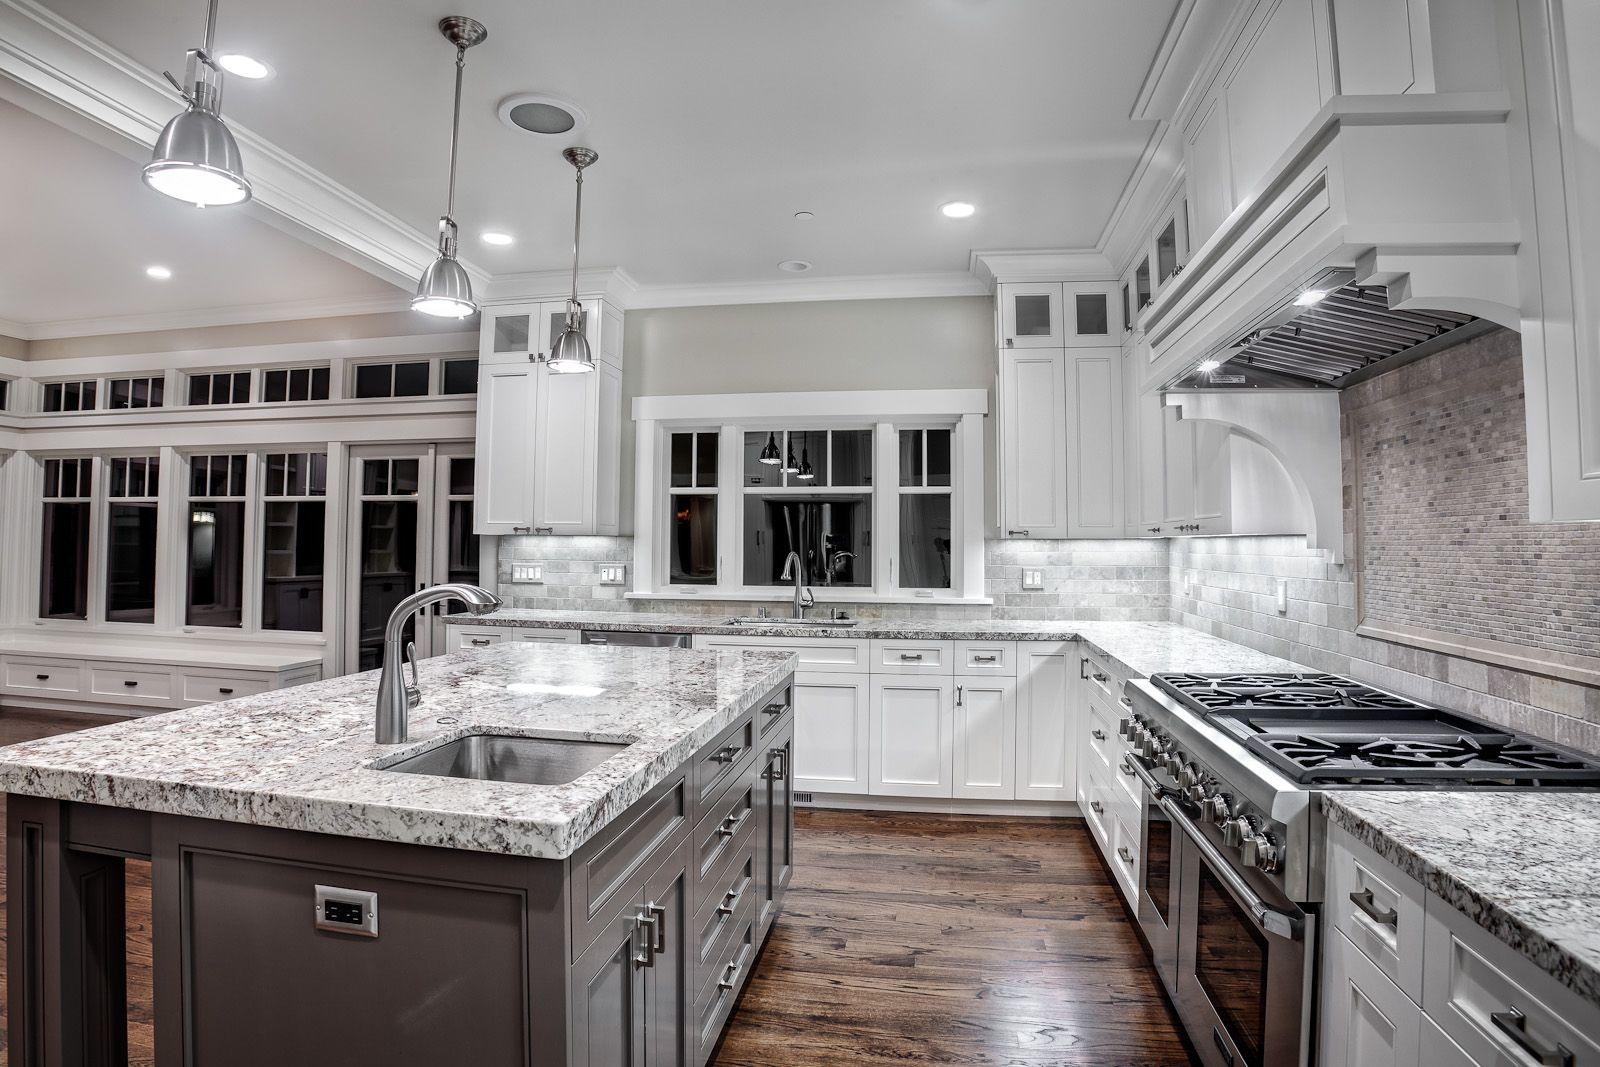 6 Things You Shouldn't Do On Your Granite Countertops ... on Backsplash:gjexfbx4_Ly= Black Granite Countertops  id=35819